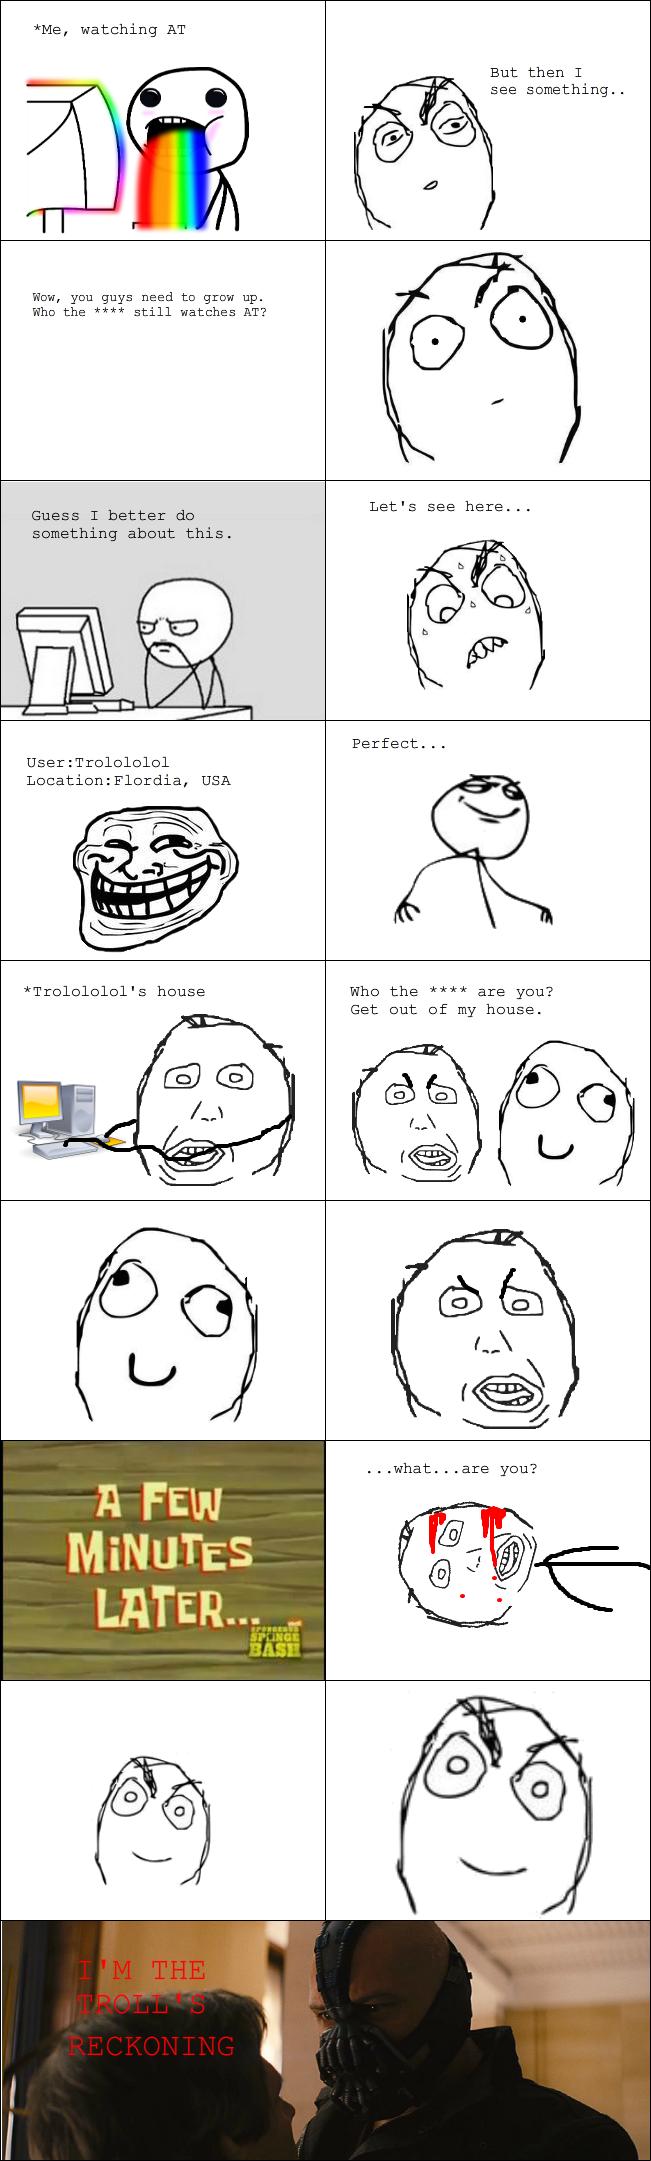 Troll's reckoning